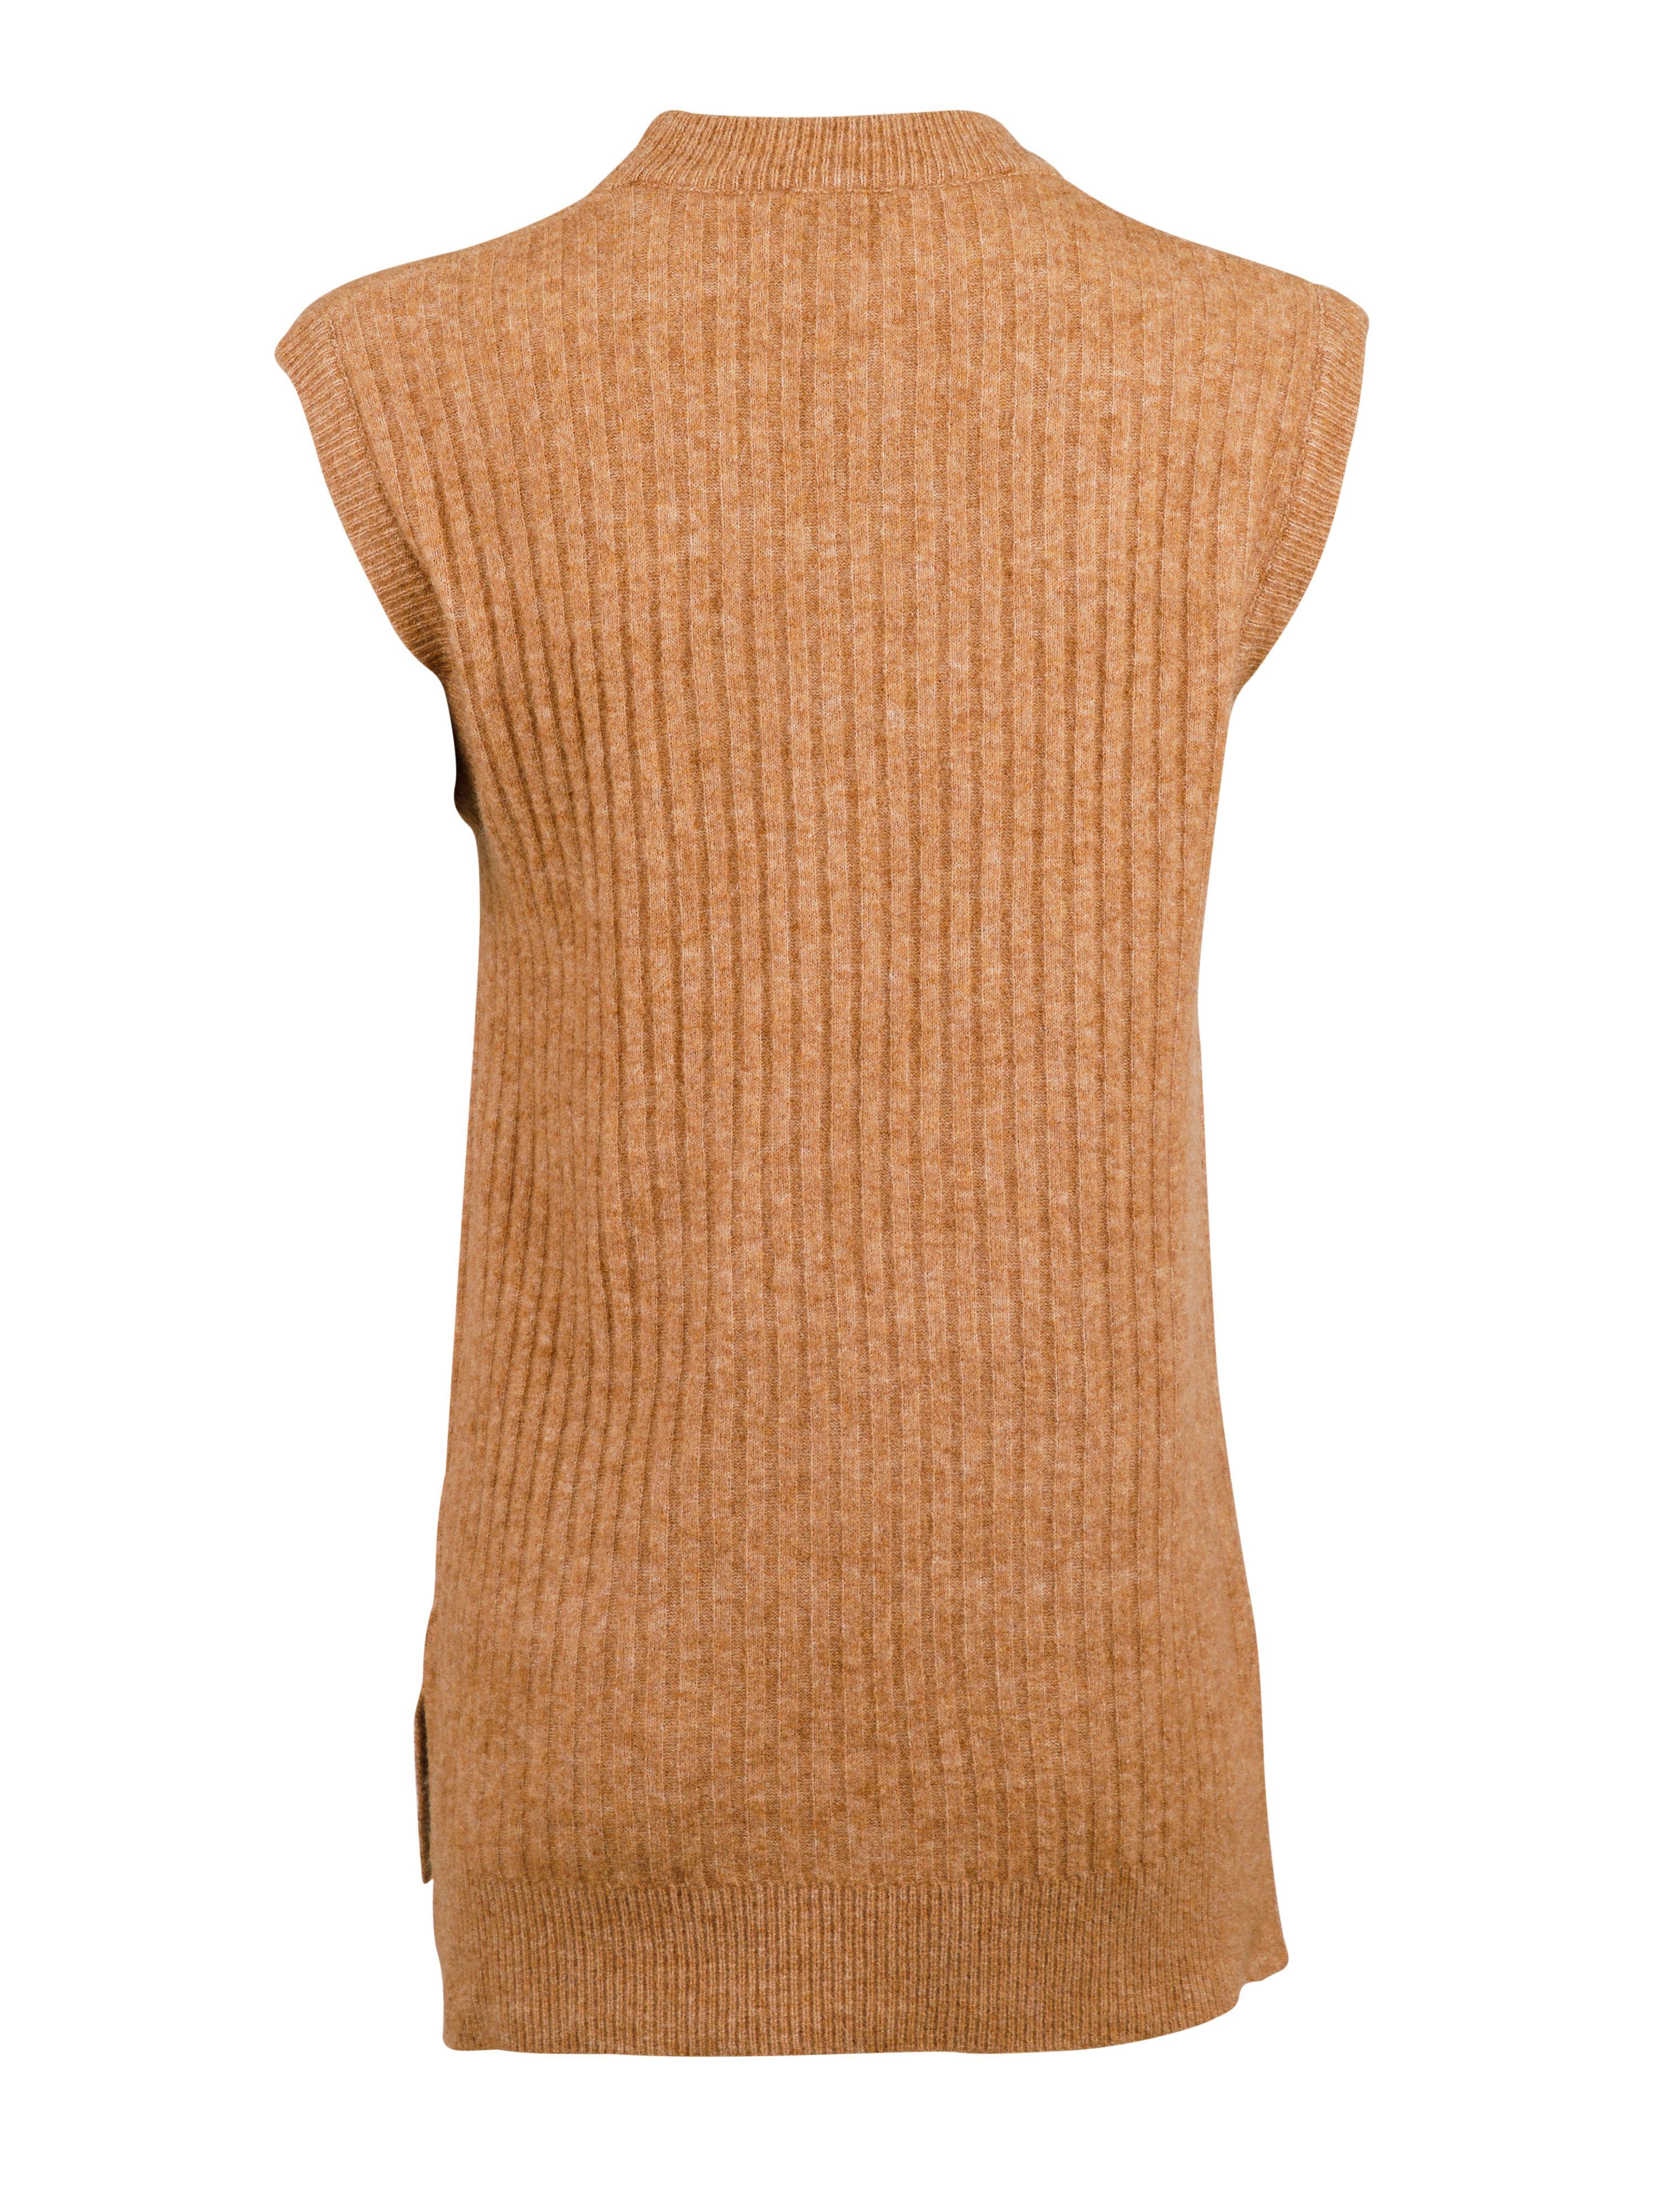 Neo Noir Natascha strik vest, brown melange, small